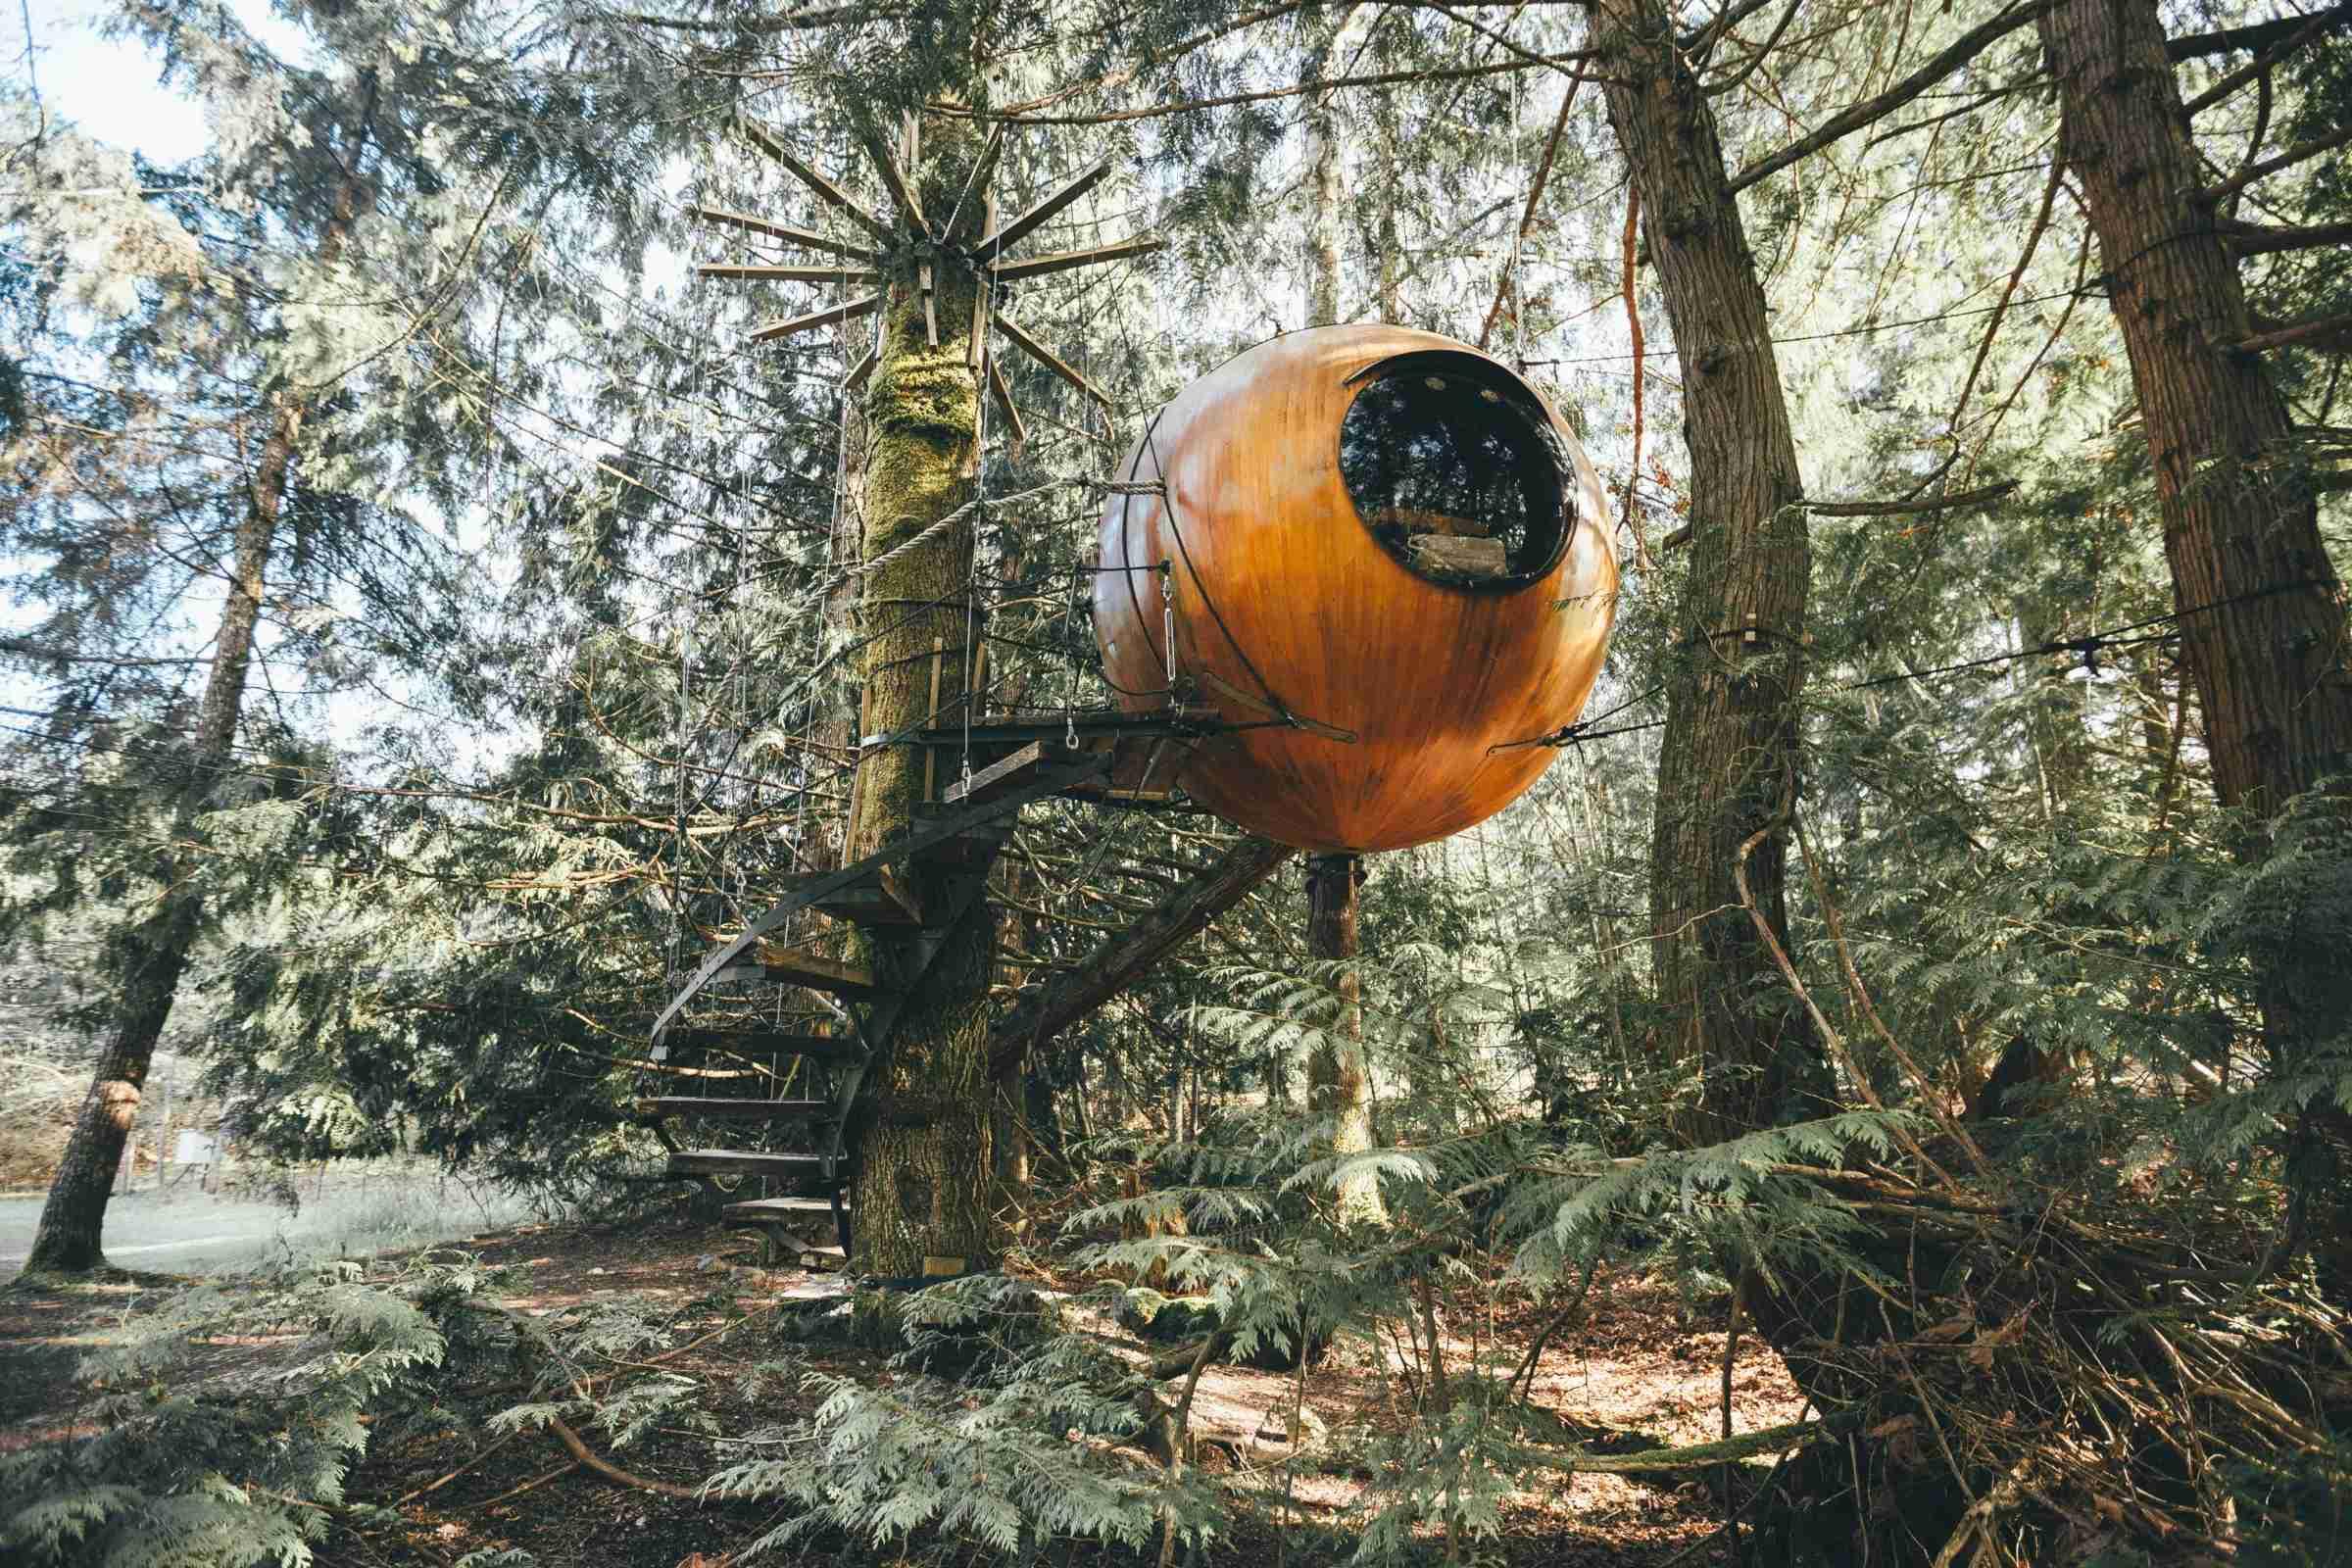 Free Spirit Spheres. Photo Courtesy of K.Kemsley.